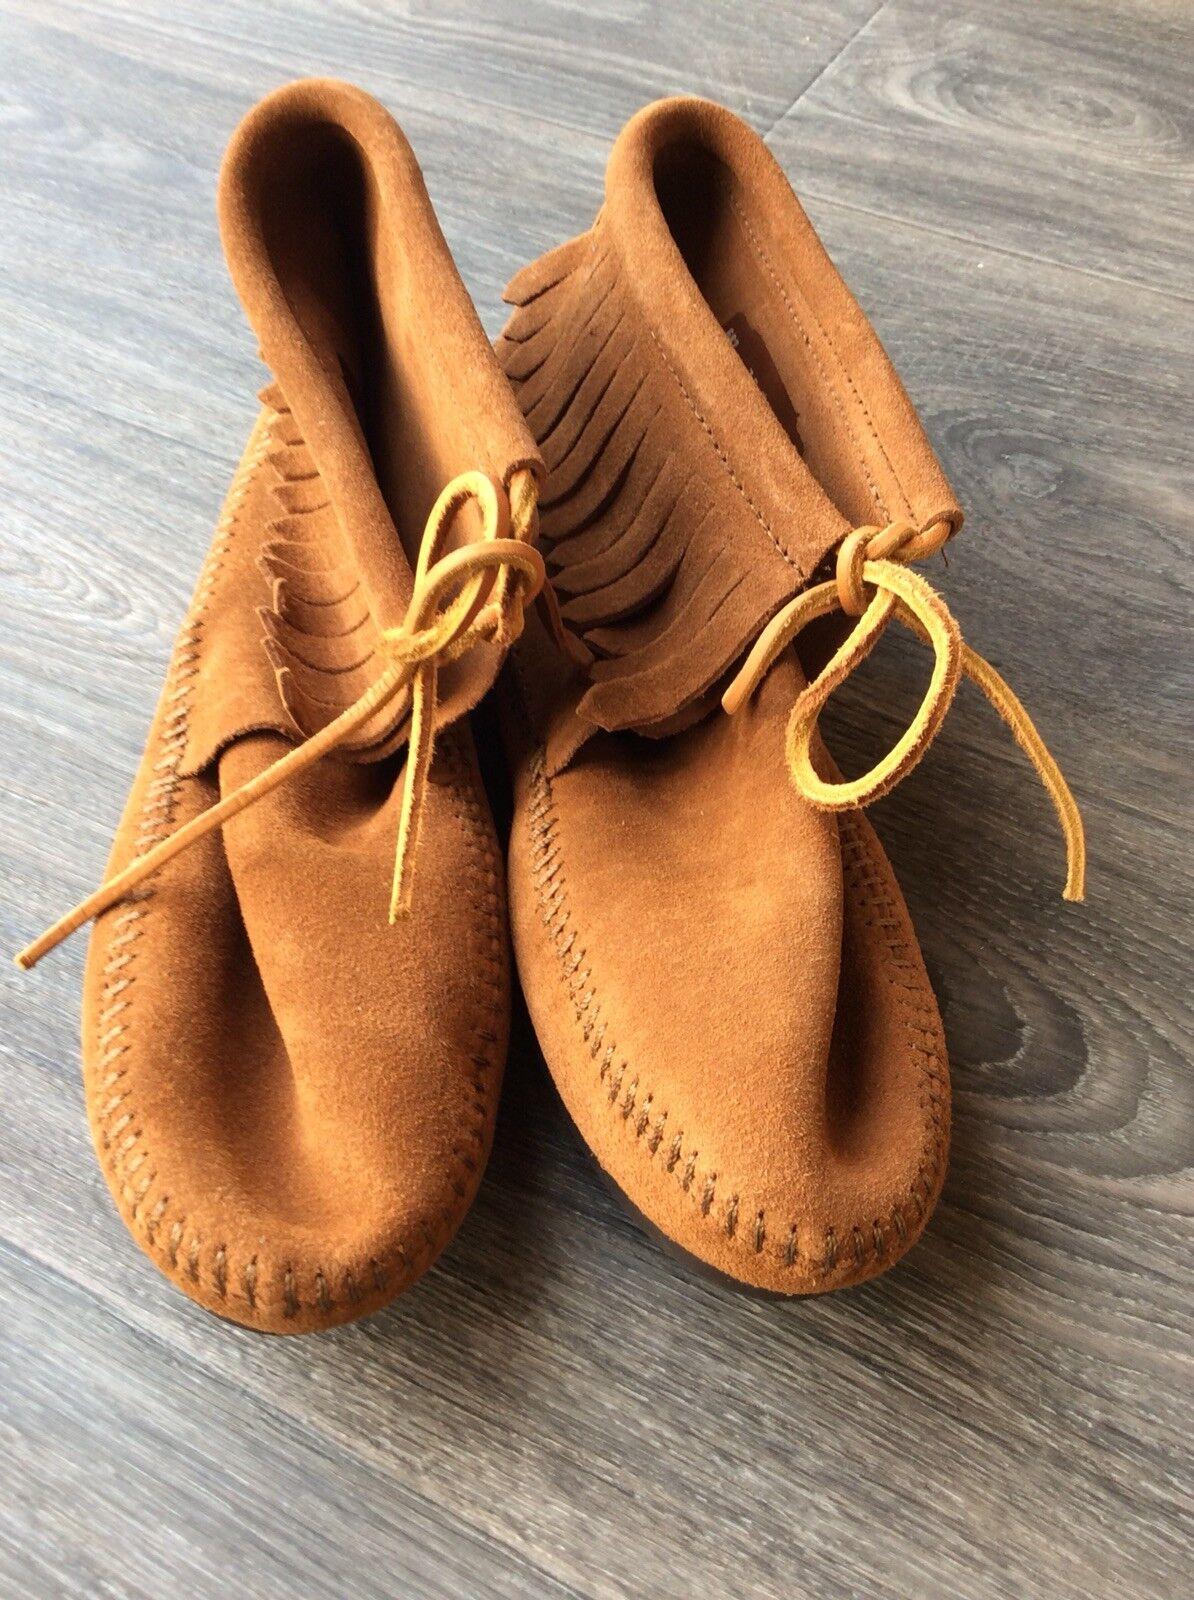 Minnetonka Women's Hardsole Fringe Ankle Boot Brown Suede Size 6.5